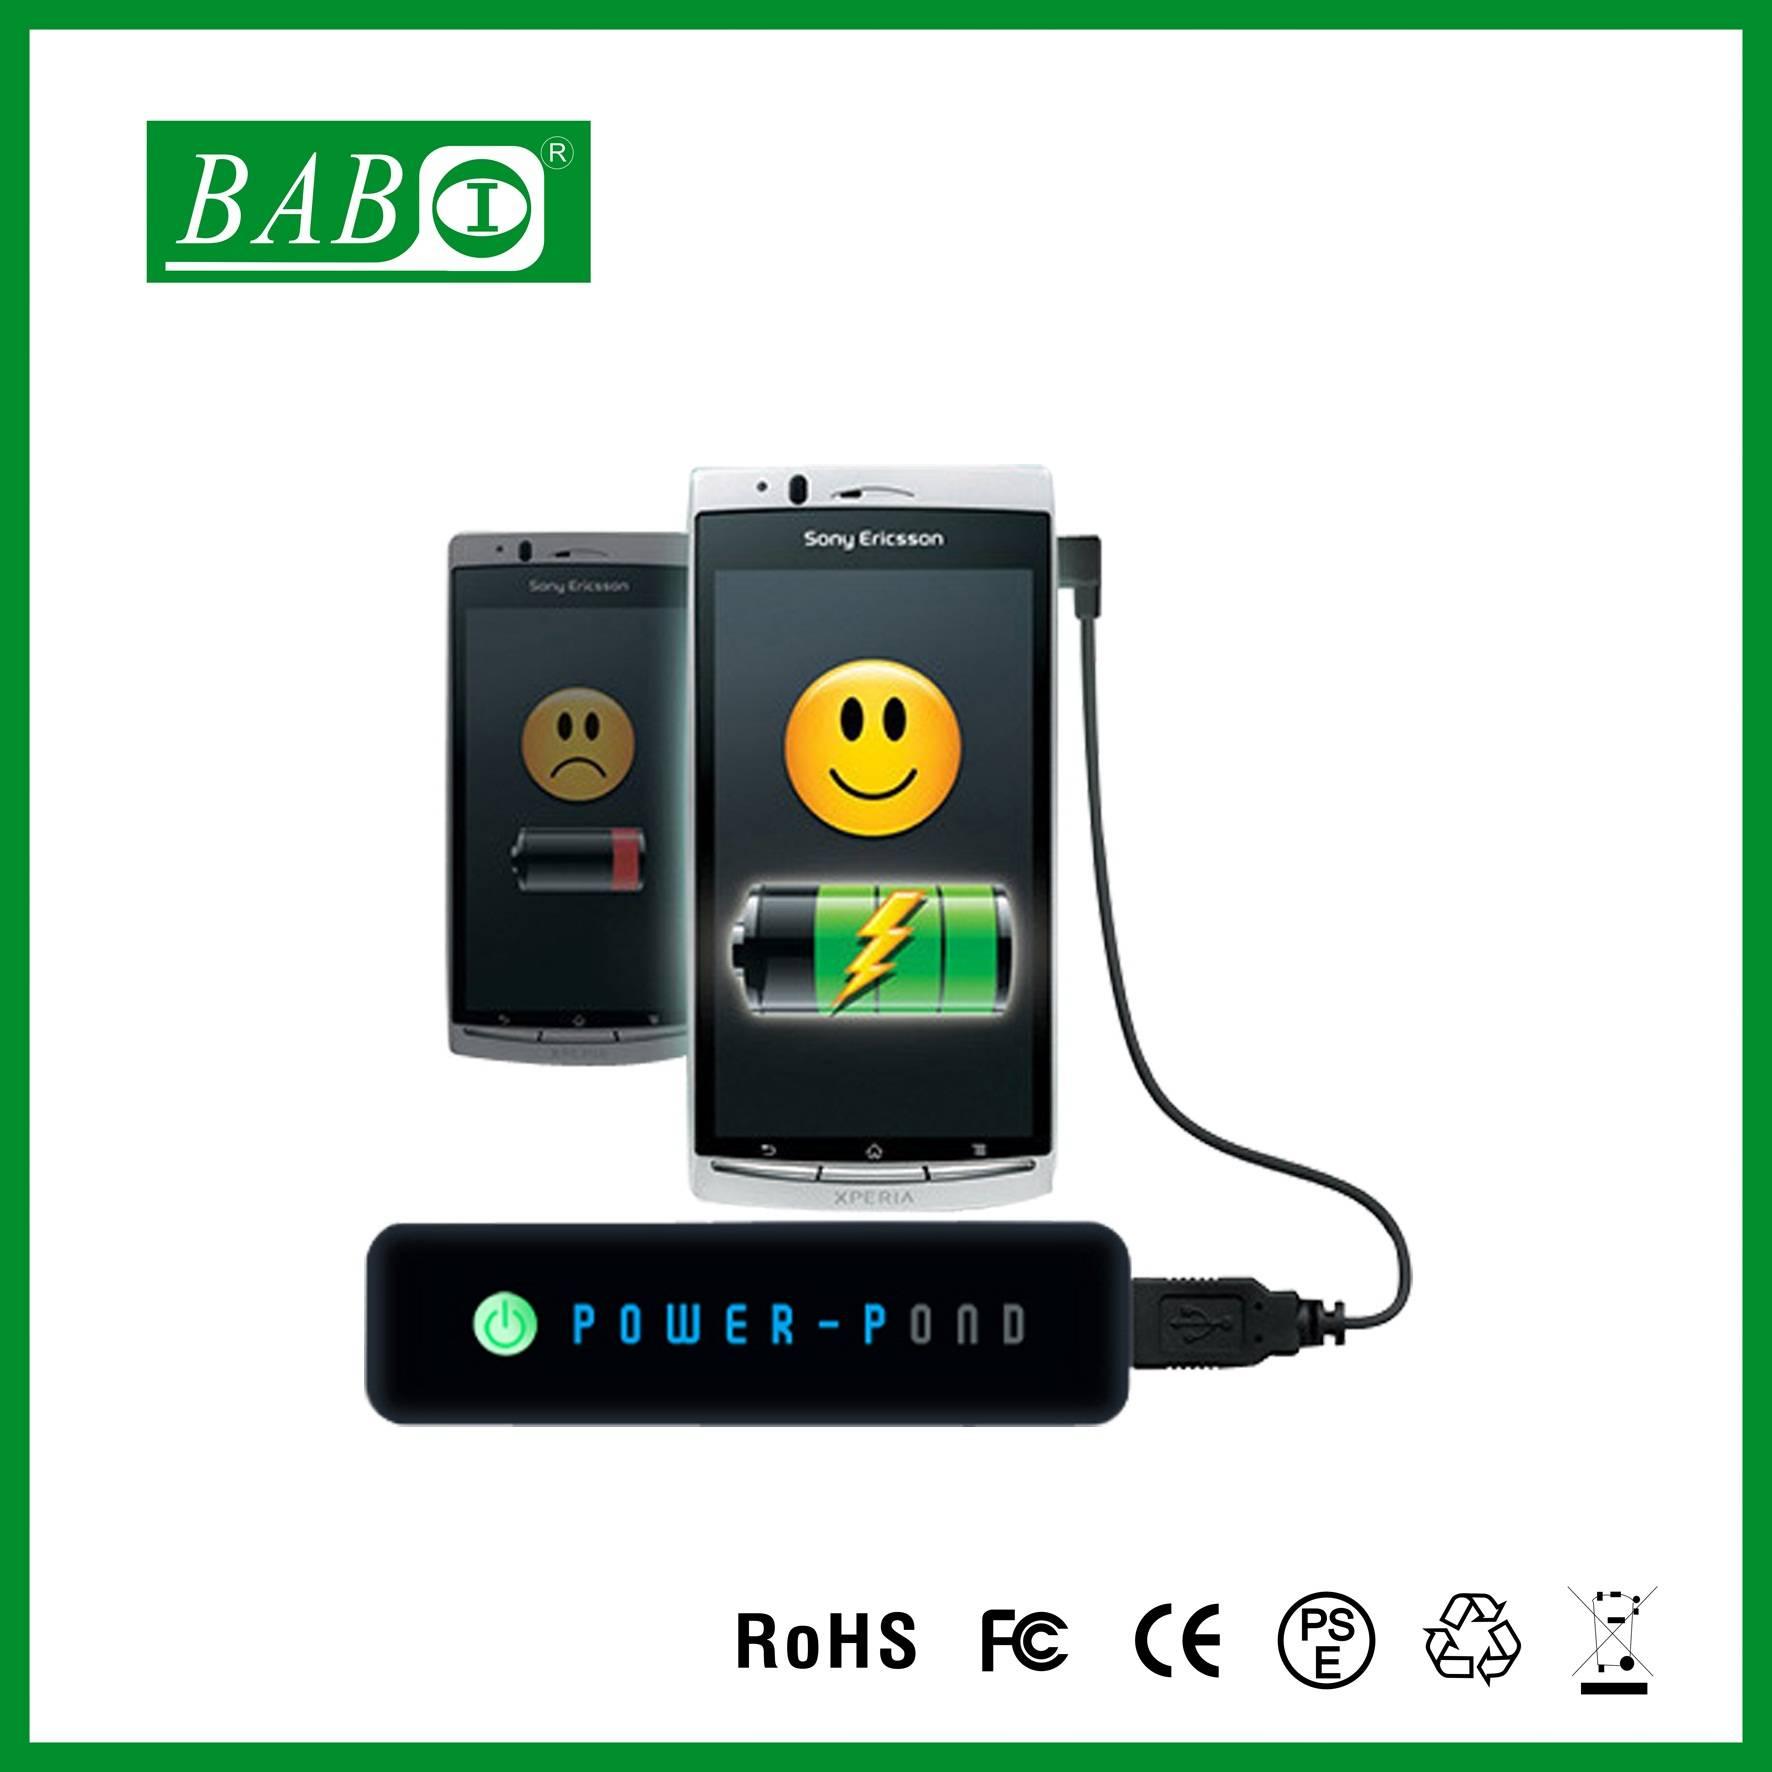 Diy universal power bank 2200mah,power bank for smart phone ,2600mah external battery for iphone 6